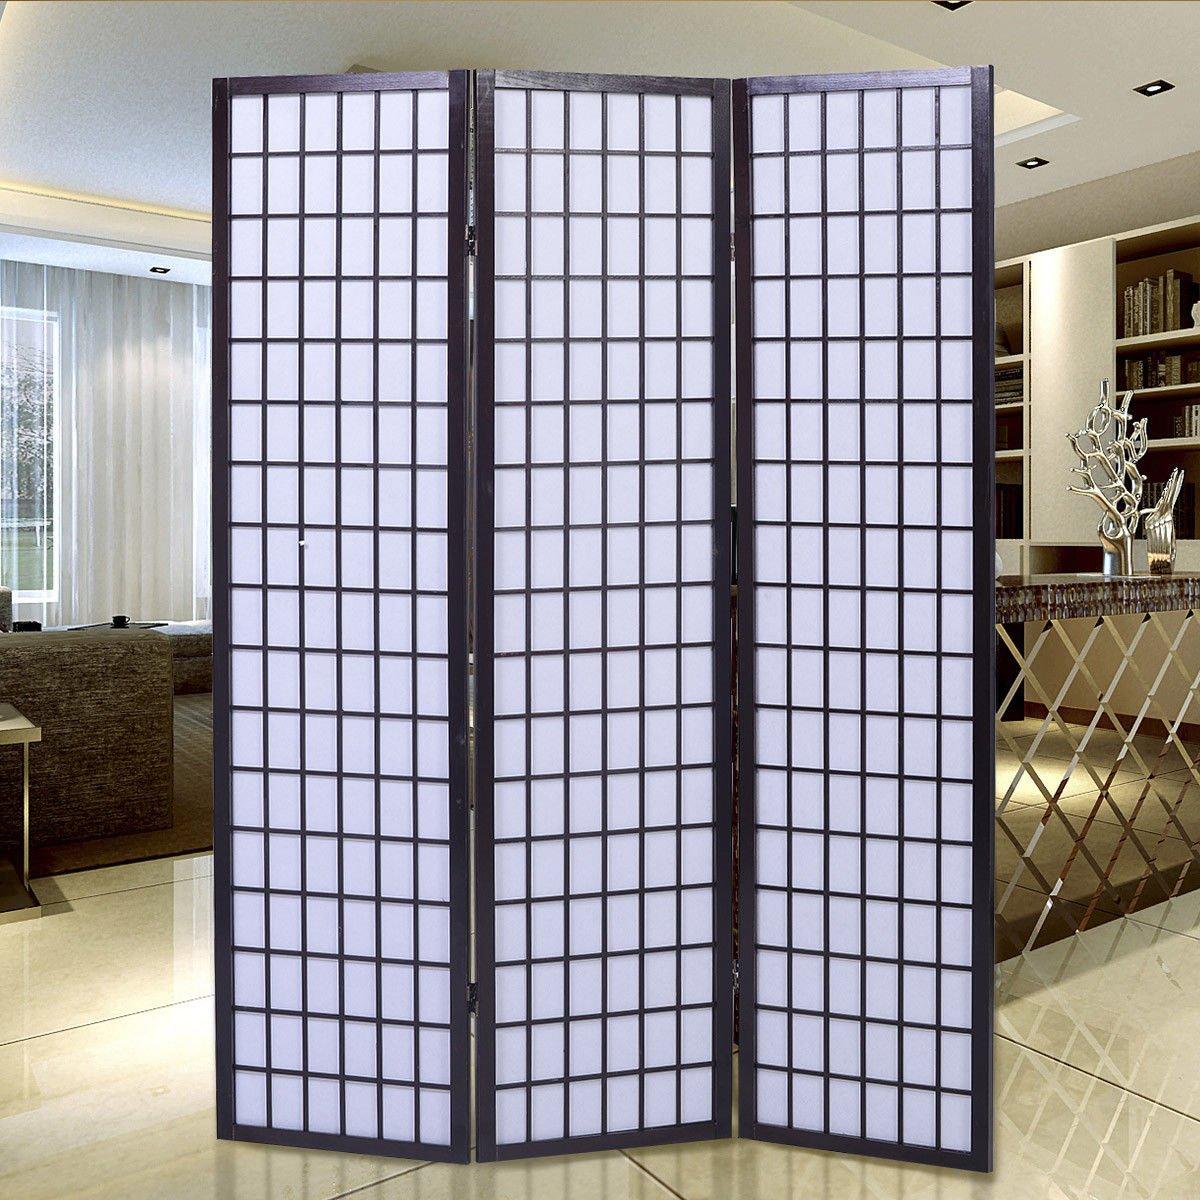 Giantex 3-Panel Room Divider Solid Shoji Wood Folding Privacy Screen Black HW56691BK